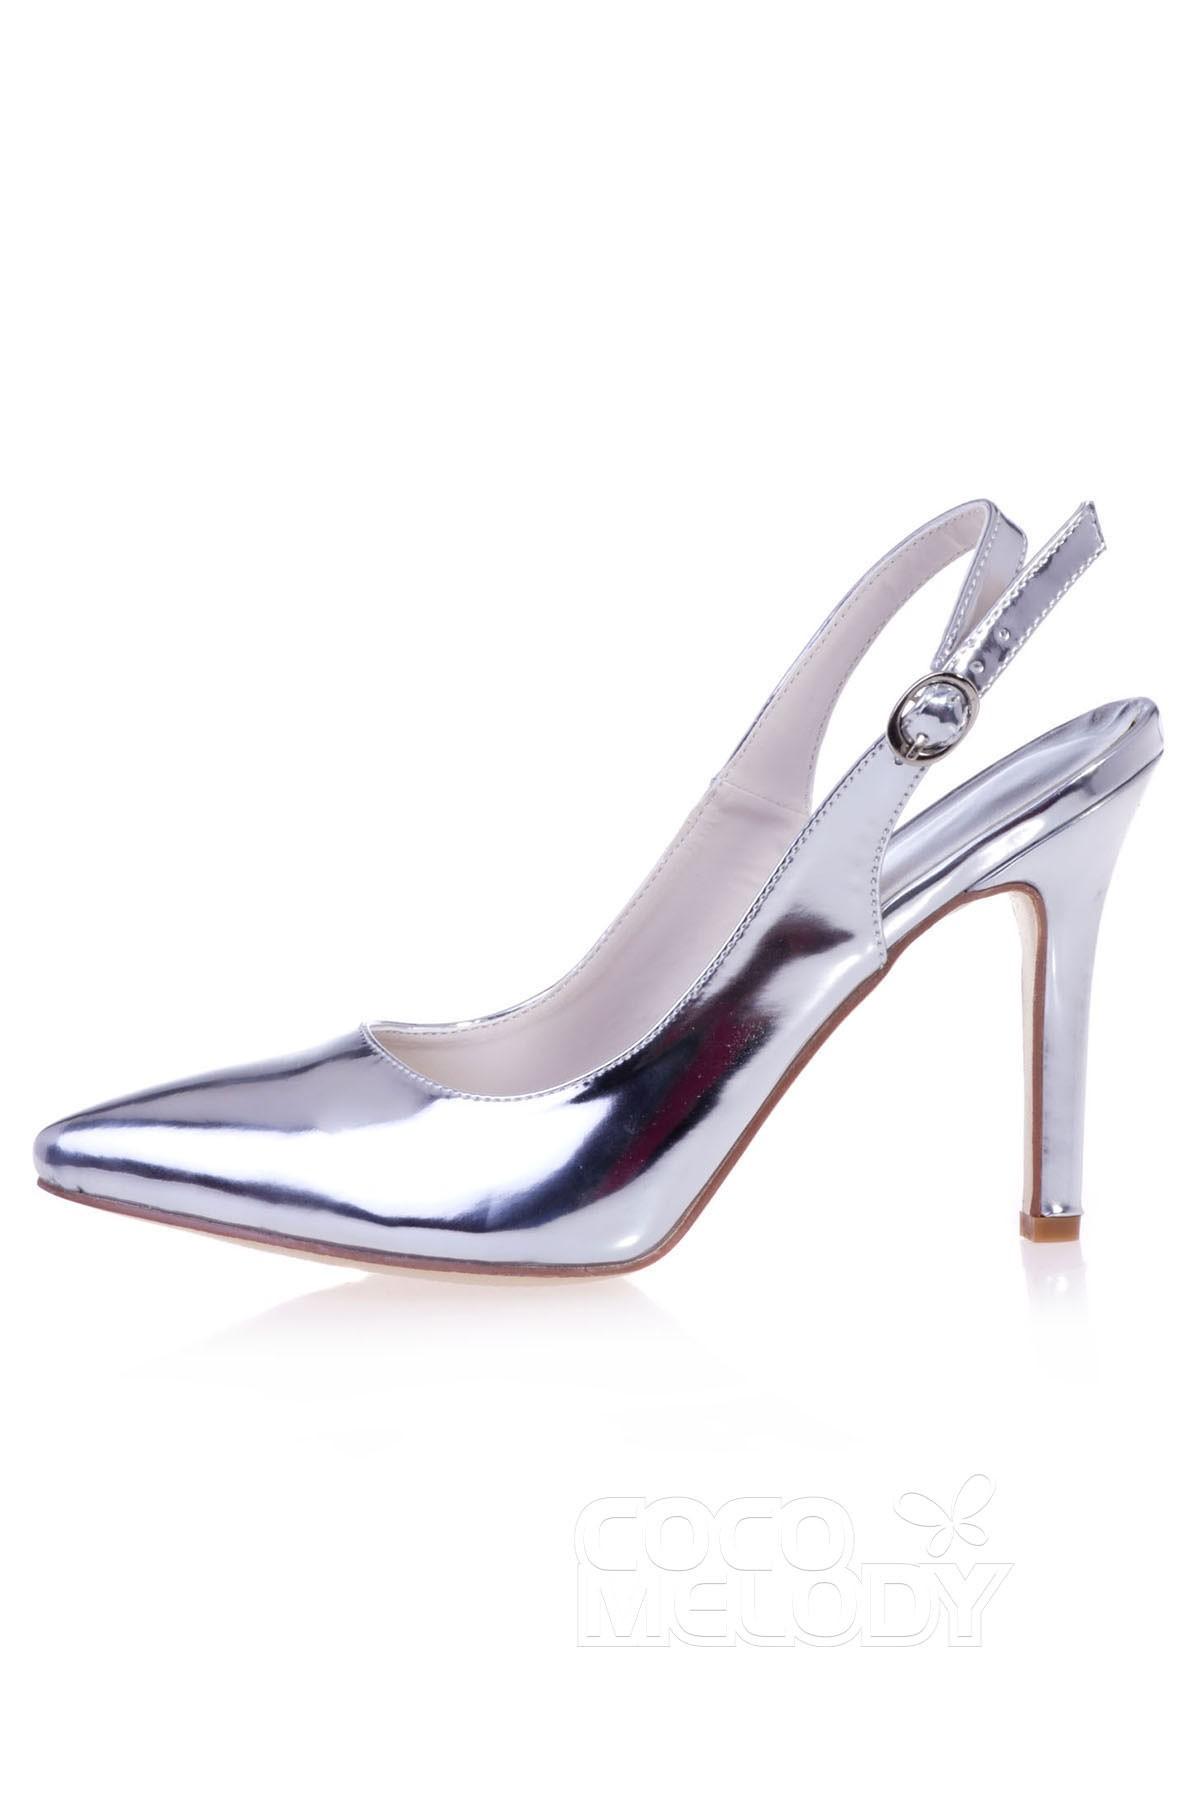 PU Stiletto Heel 9.8cm Heel Pointed Toe Dress Shoes DS16024